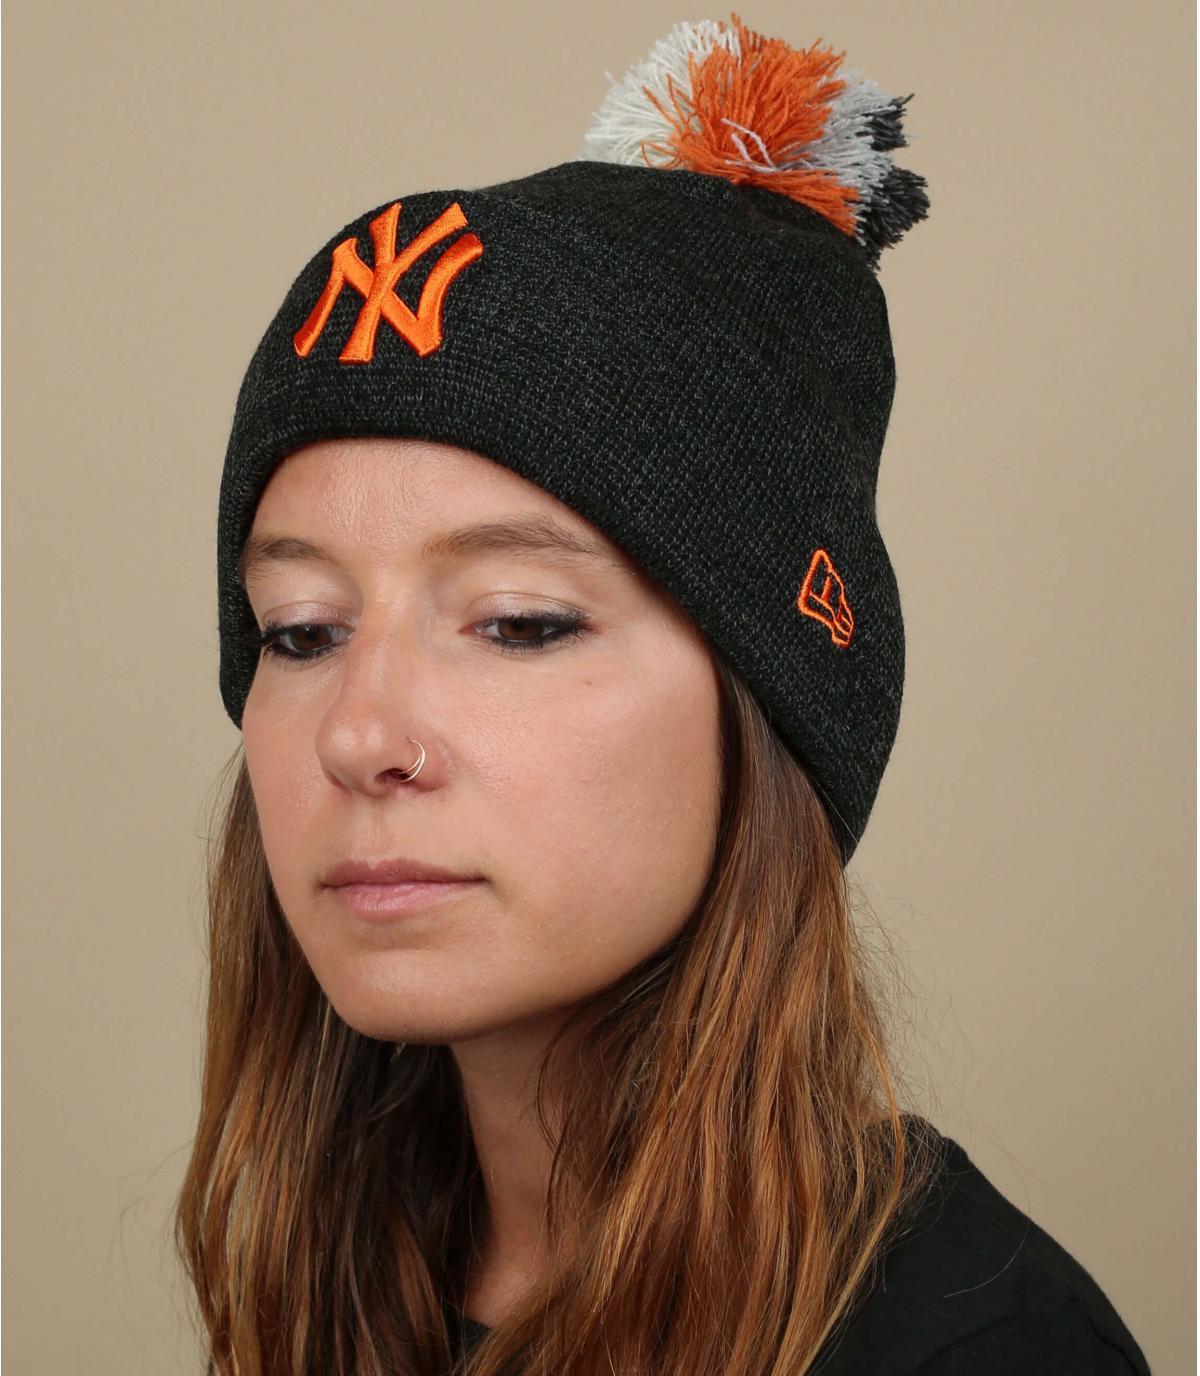 NY cappello donna grigio arancio